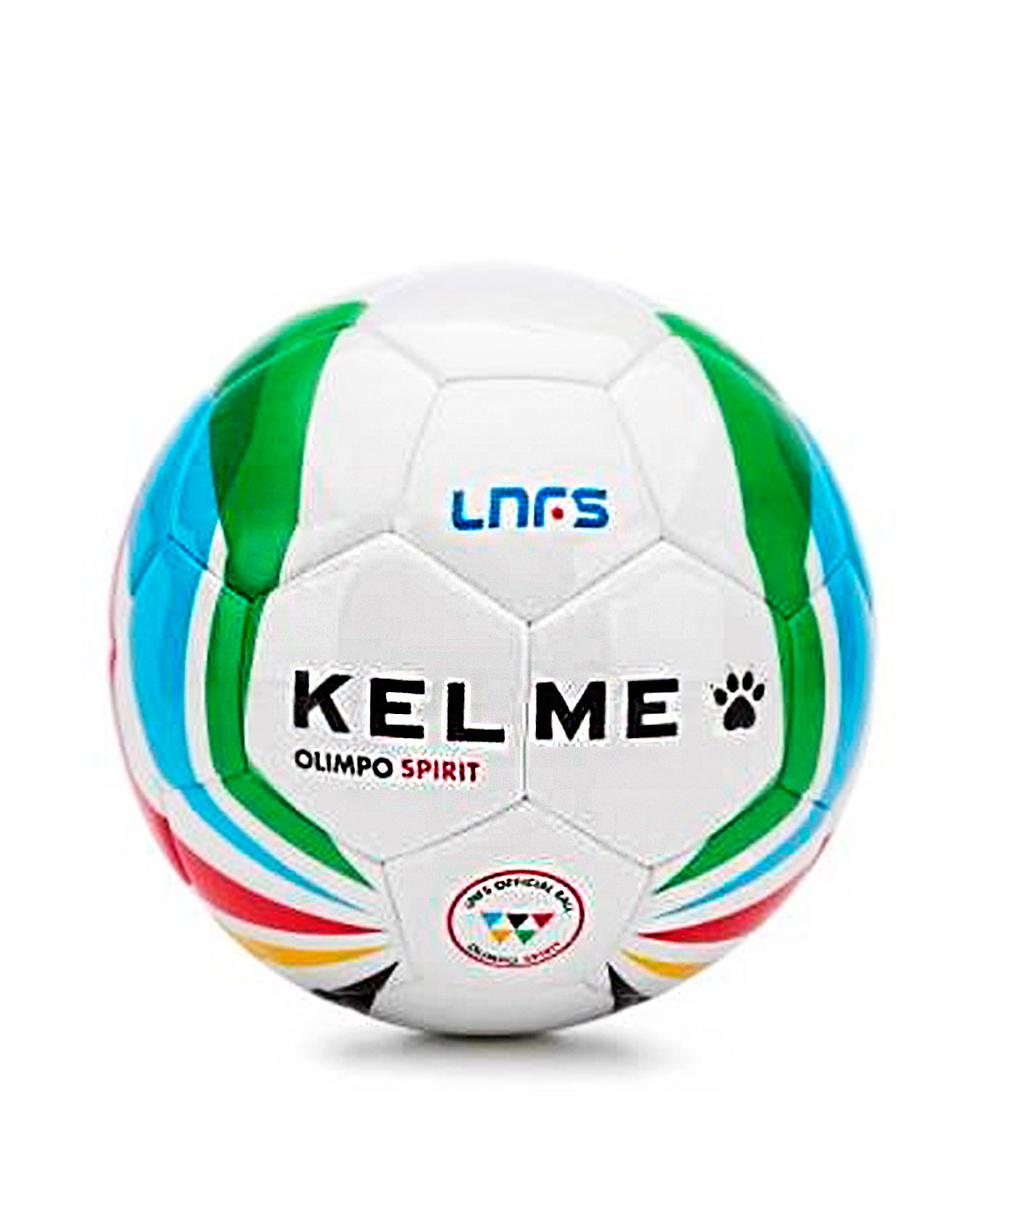 Мяч Kelme Balon LNFS 18/19 Official (4)